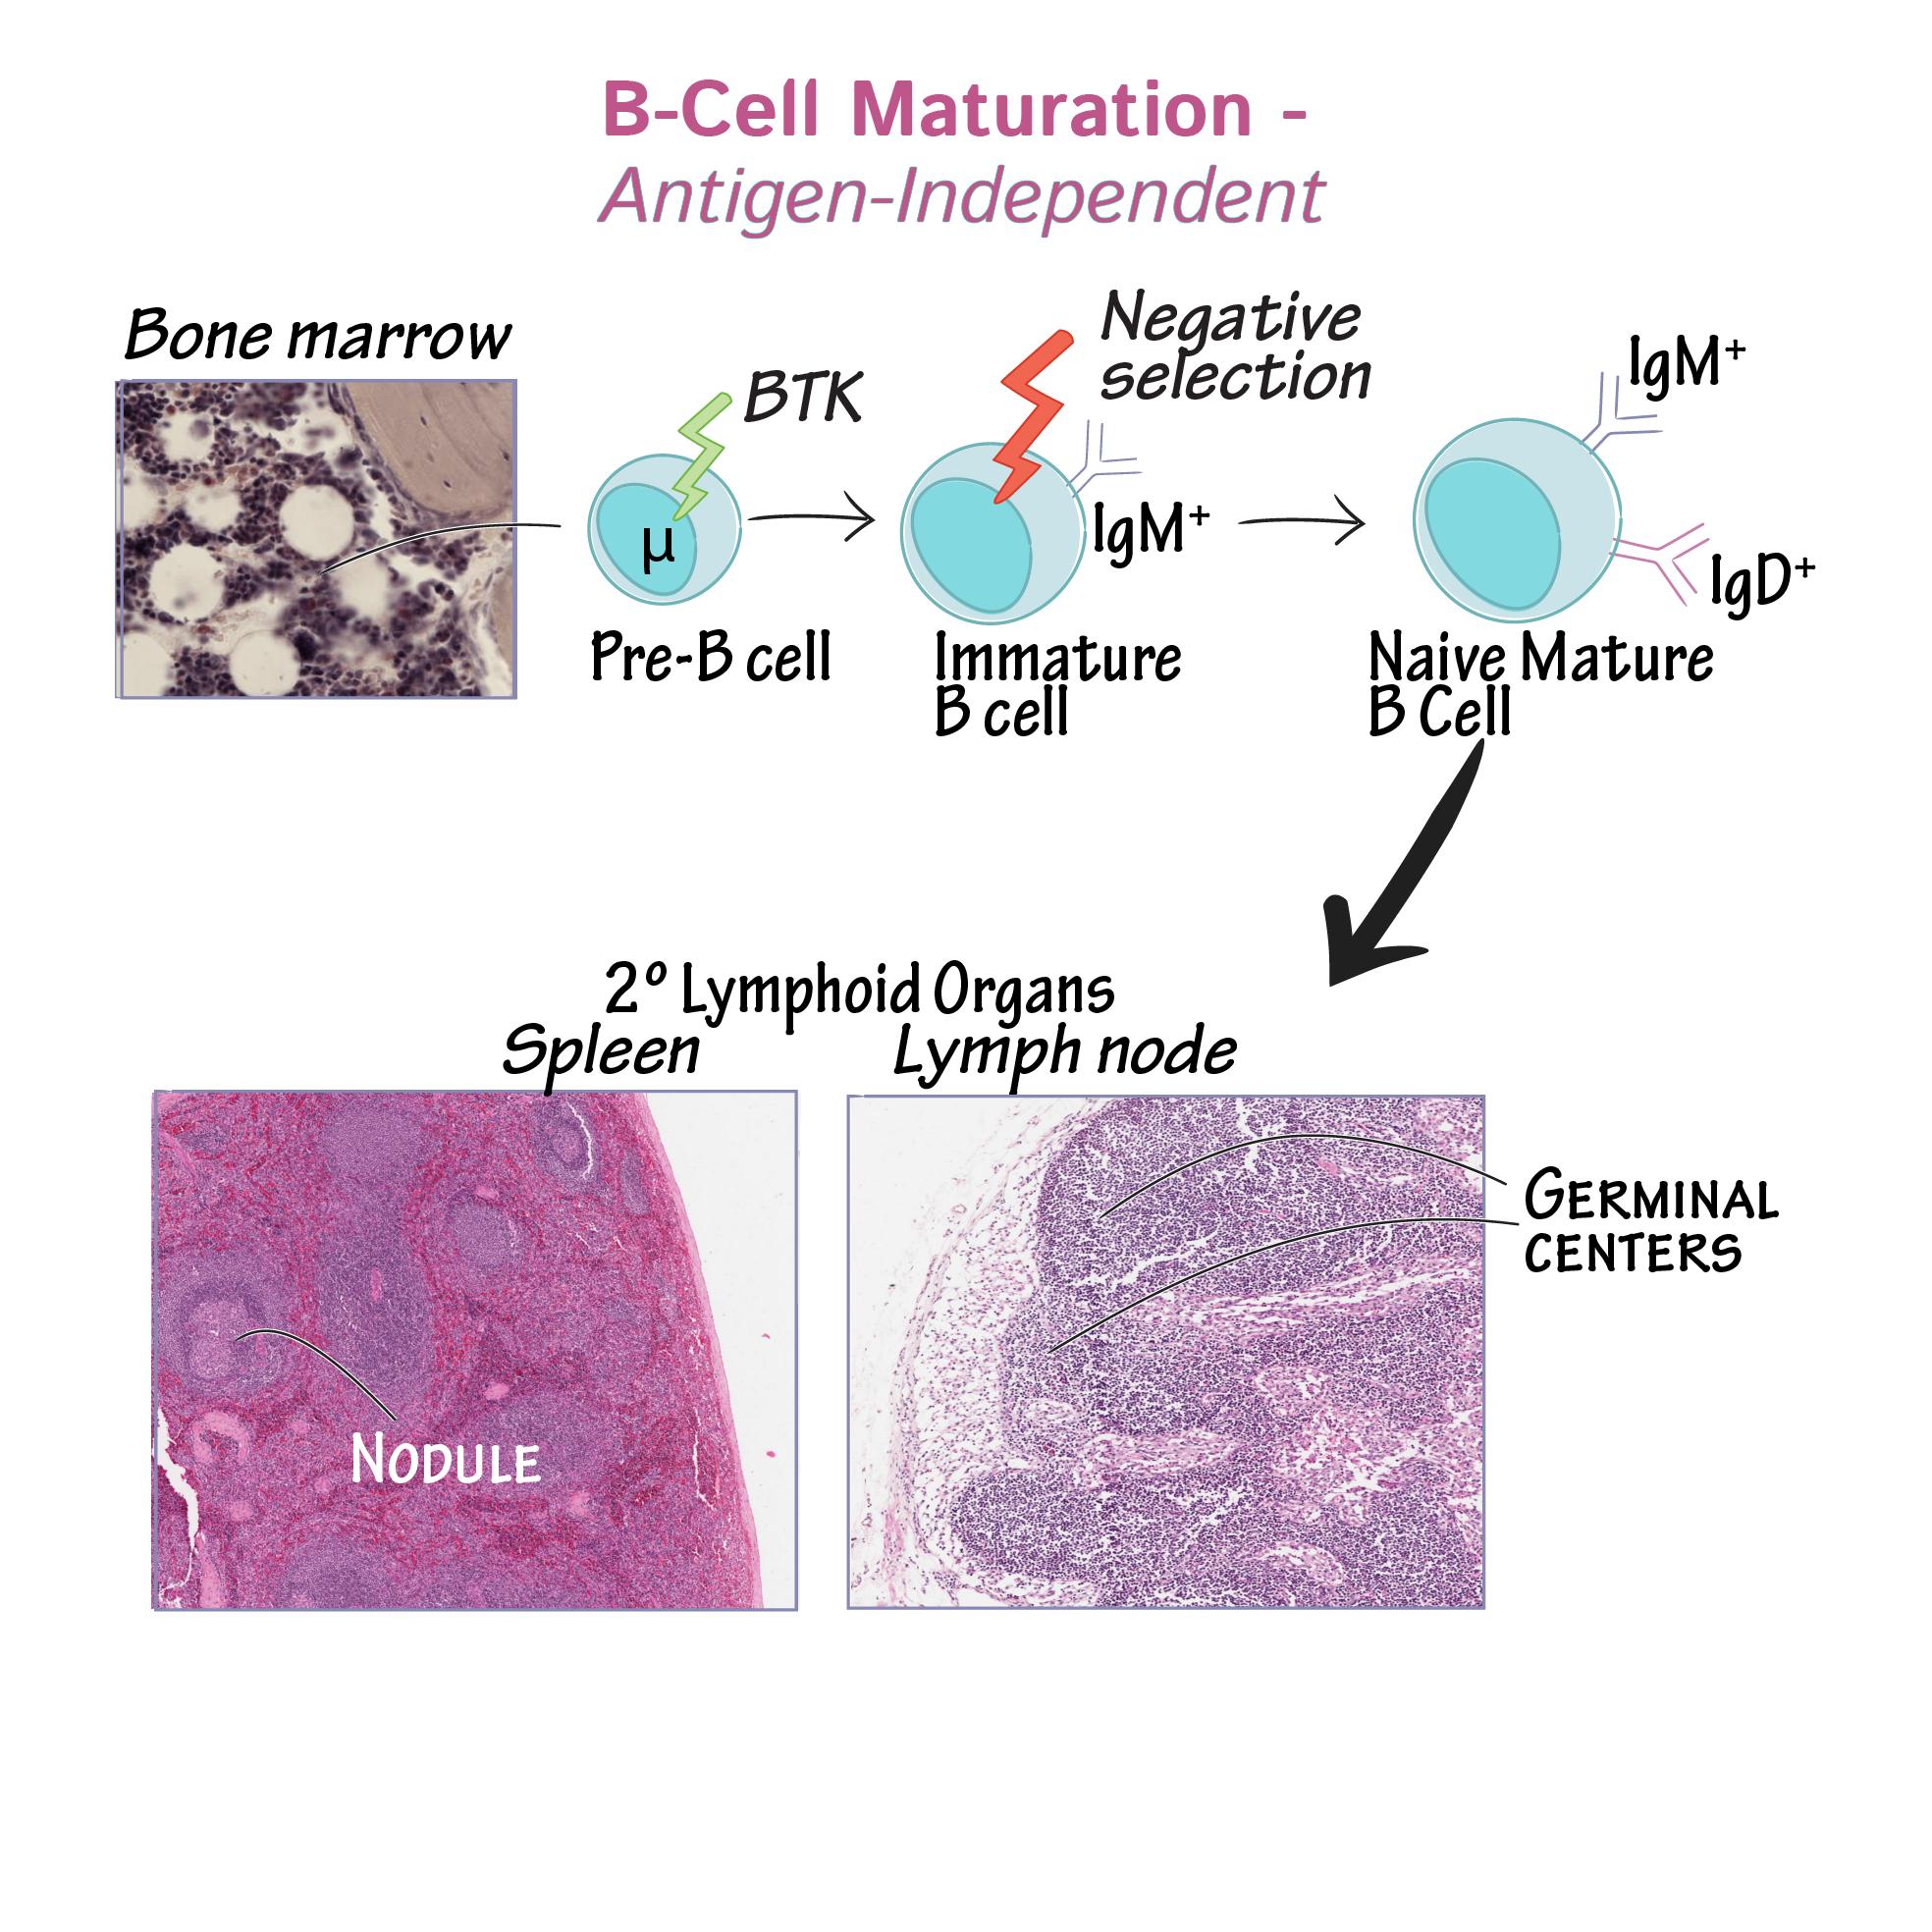 Adaptive Immunity